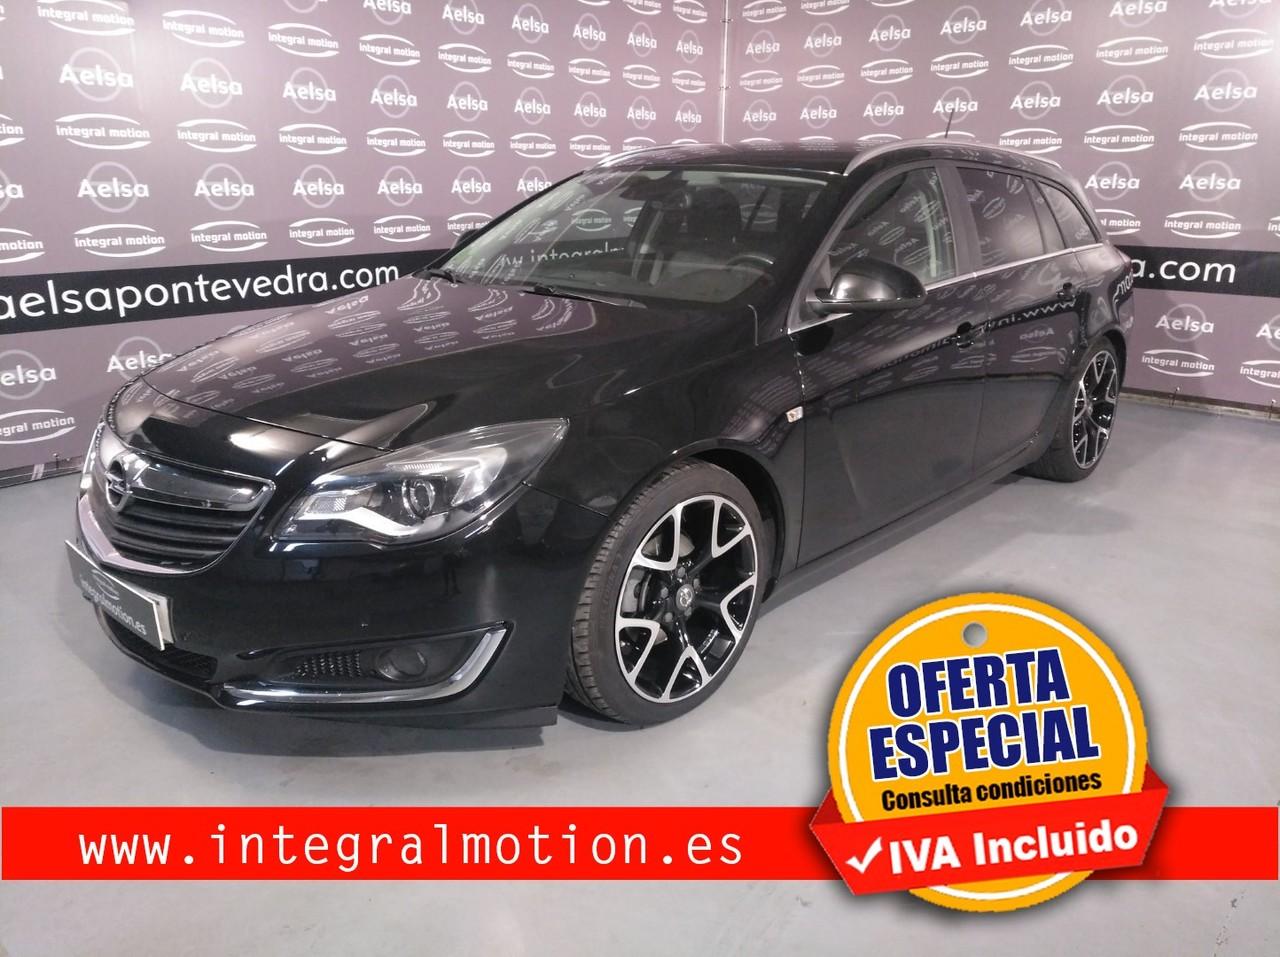 Opel Insignia ST 1.6 CDTI S&S ecoFLEX 100kW Selective  - Foto 1